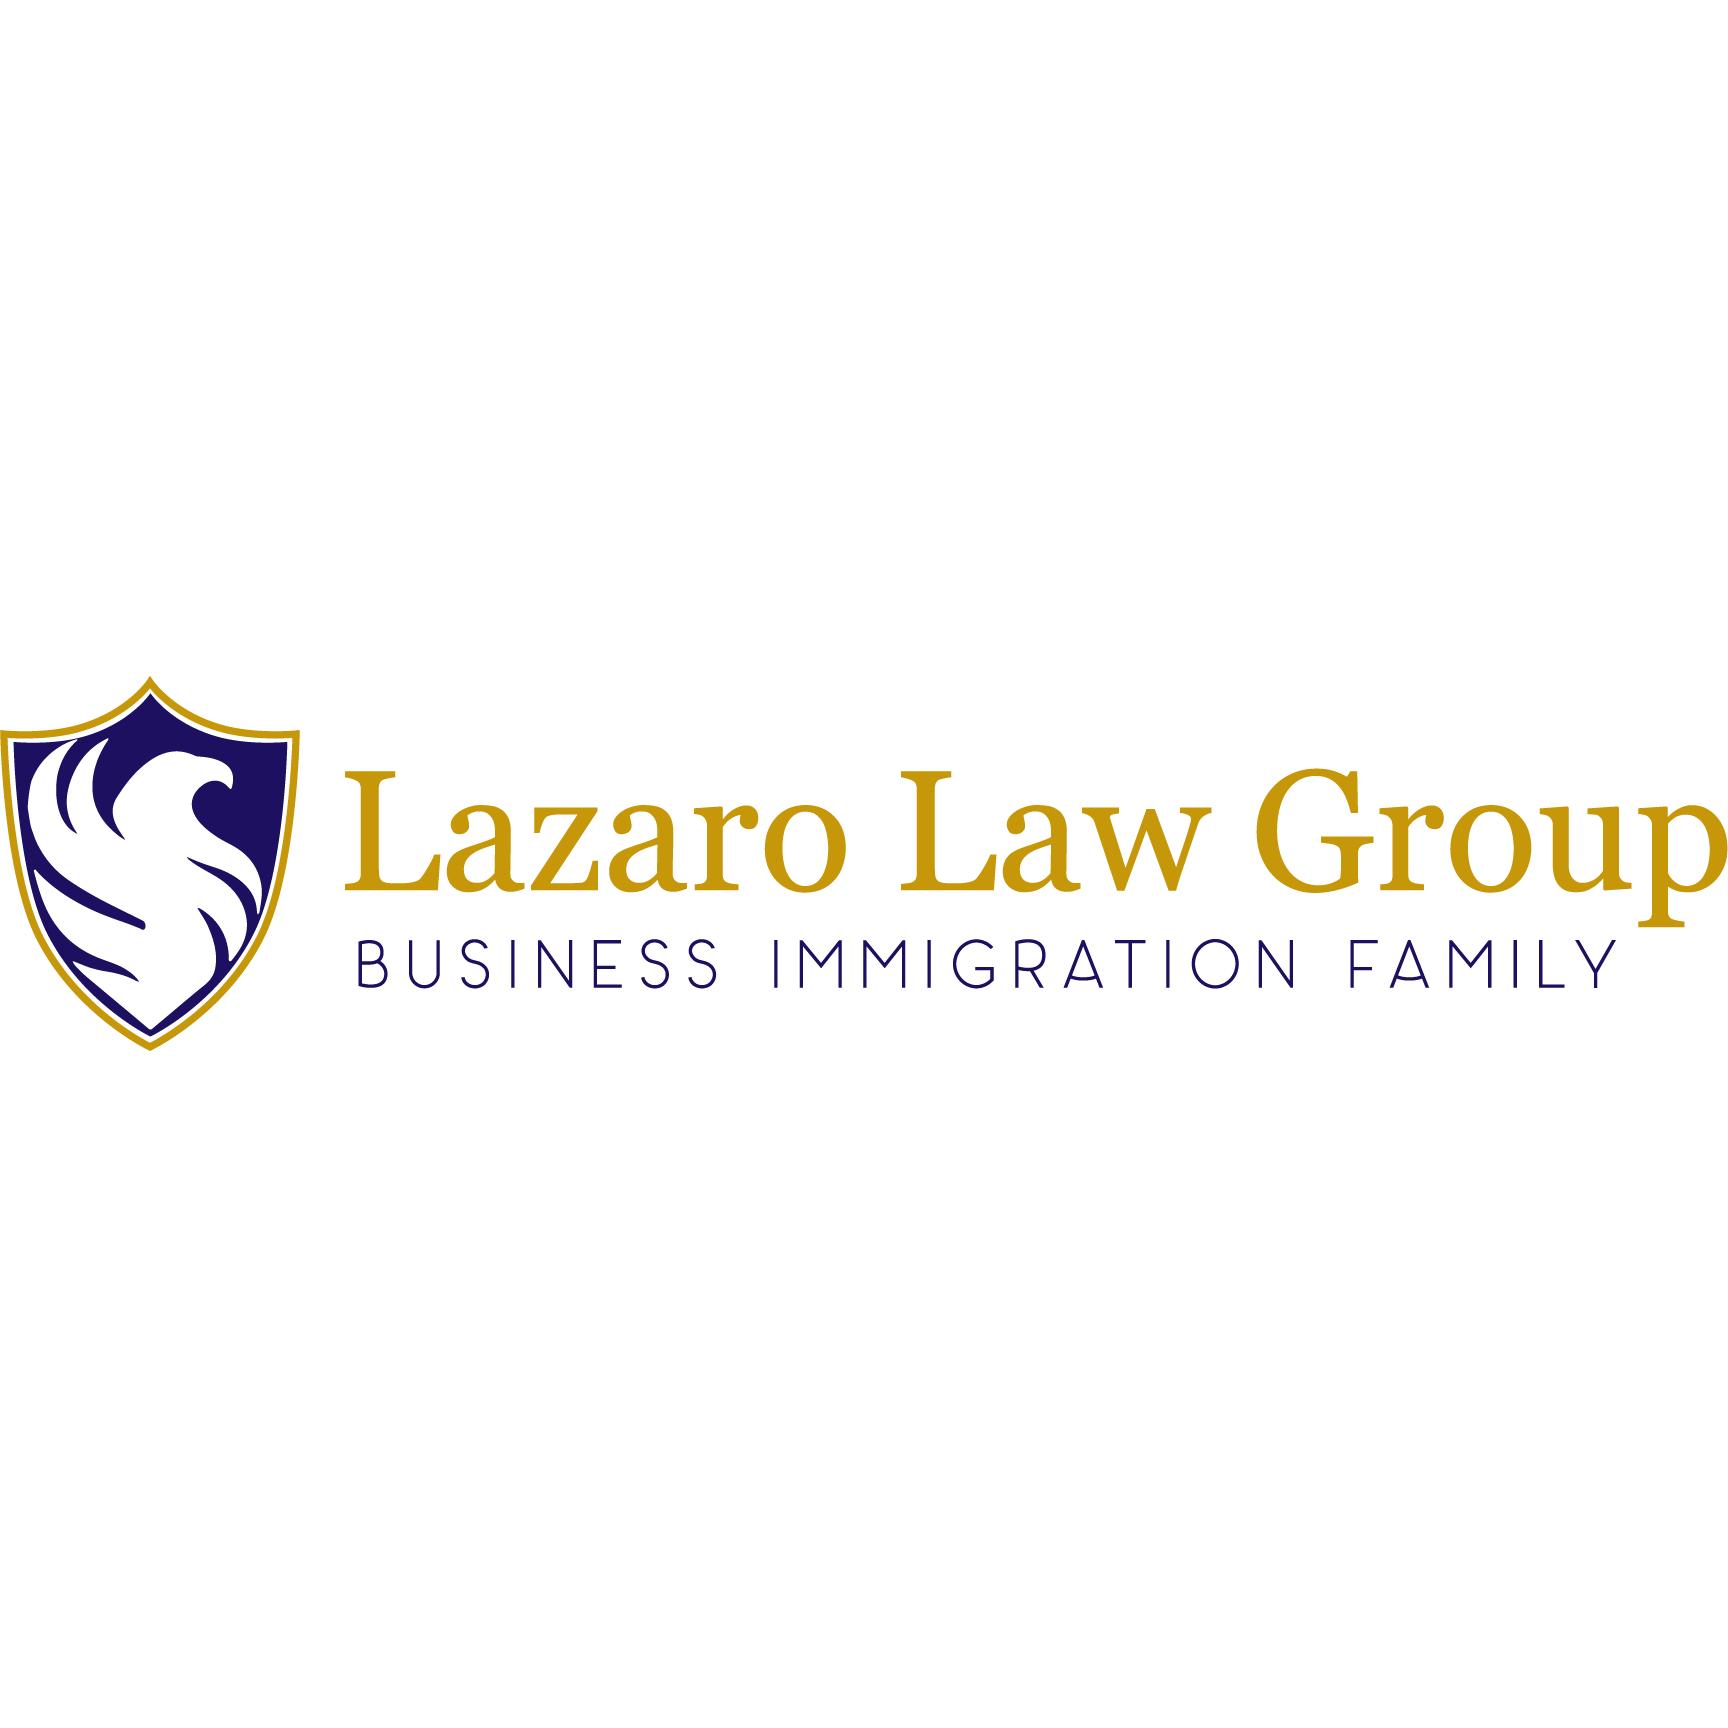 Lazaro Law Group